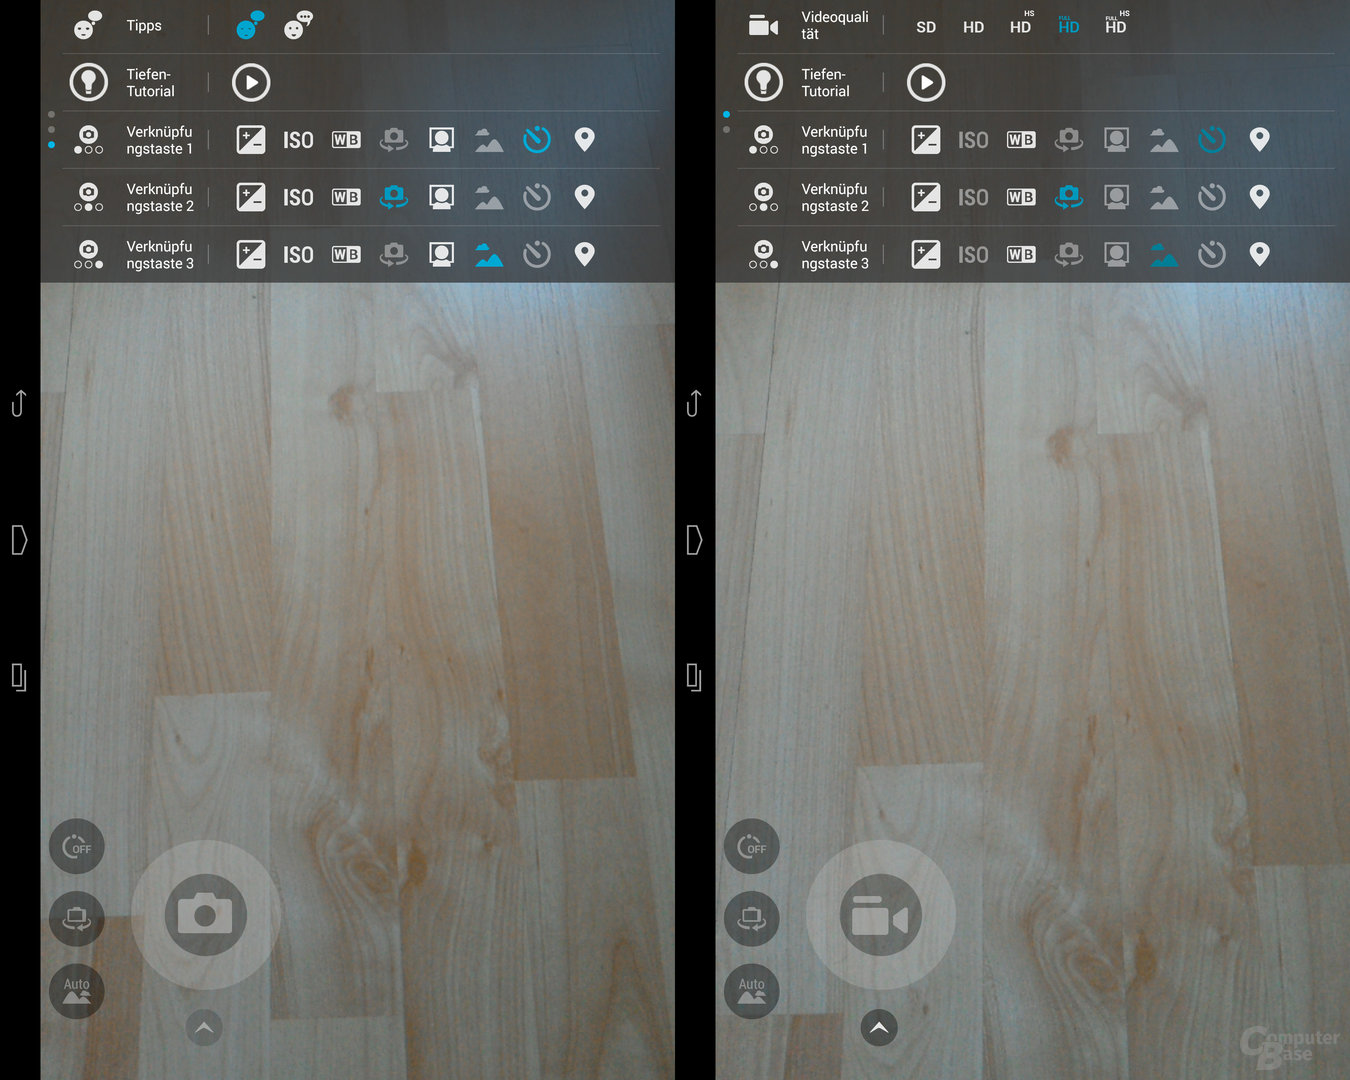 Dell Venue 8 Kamera-Applikation